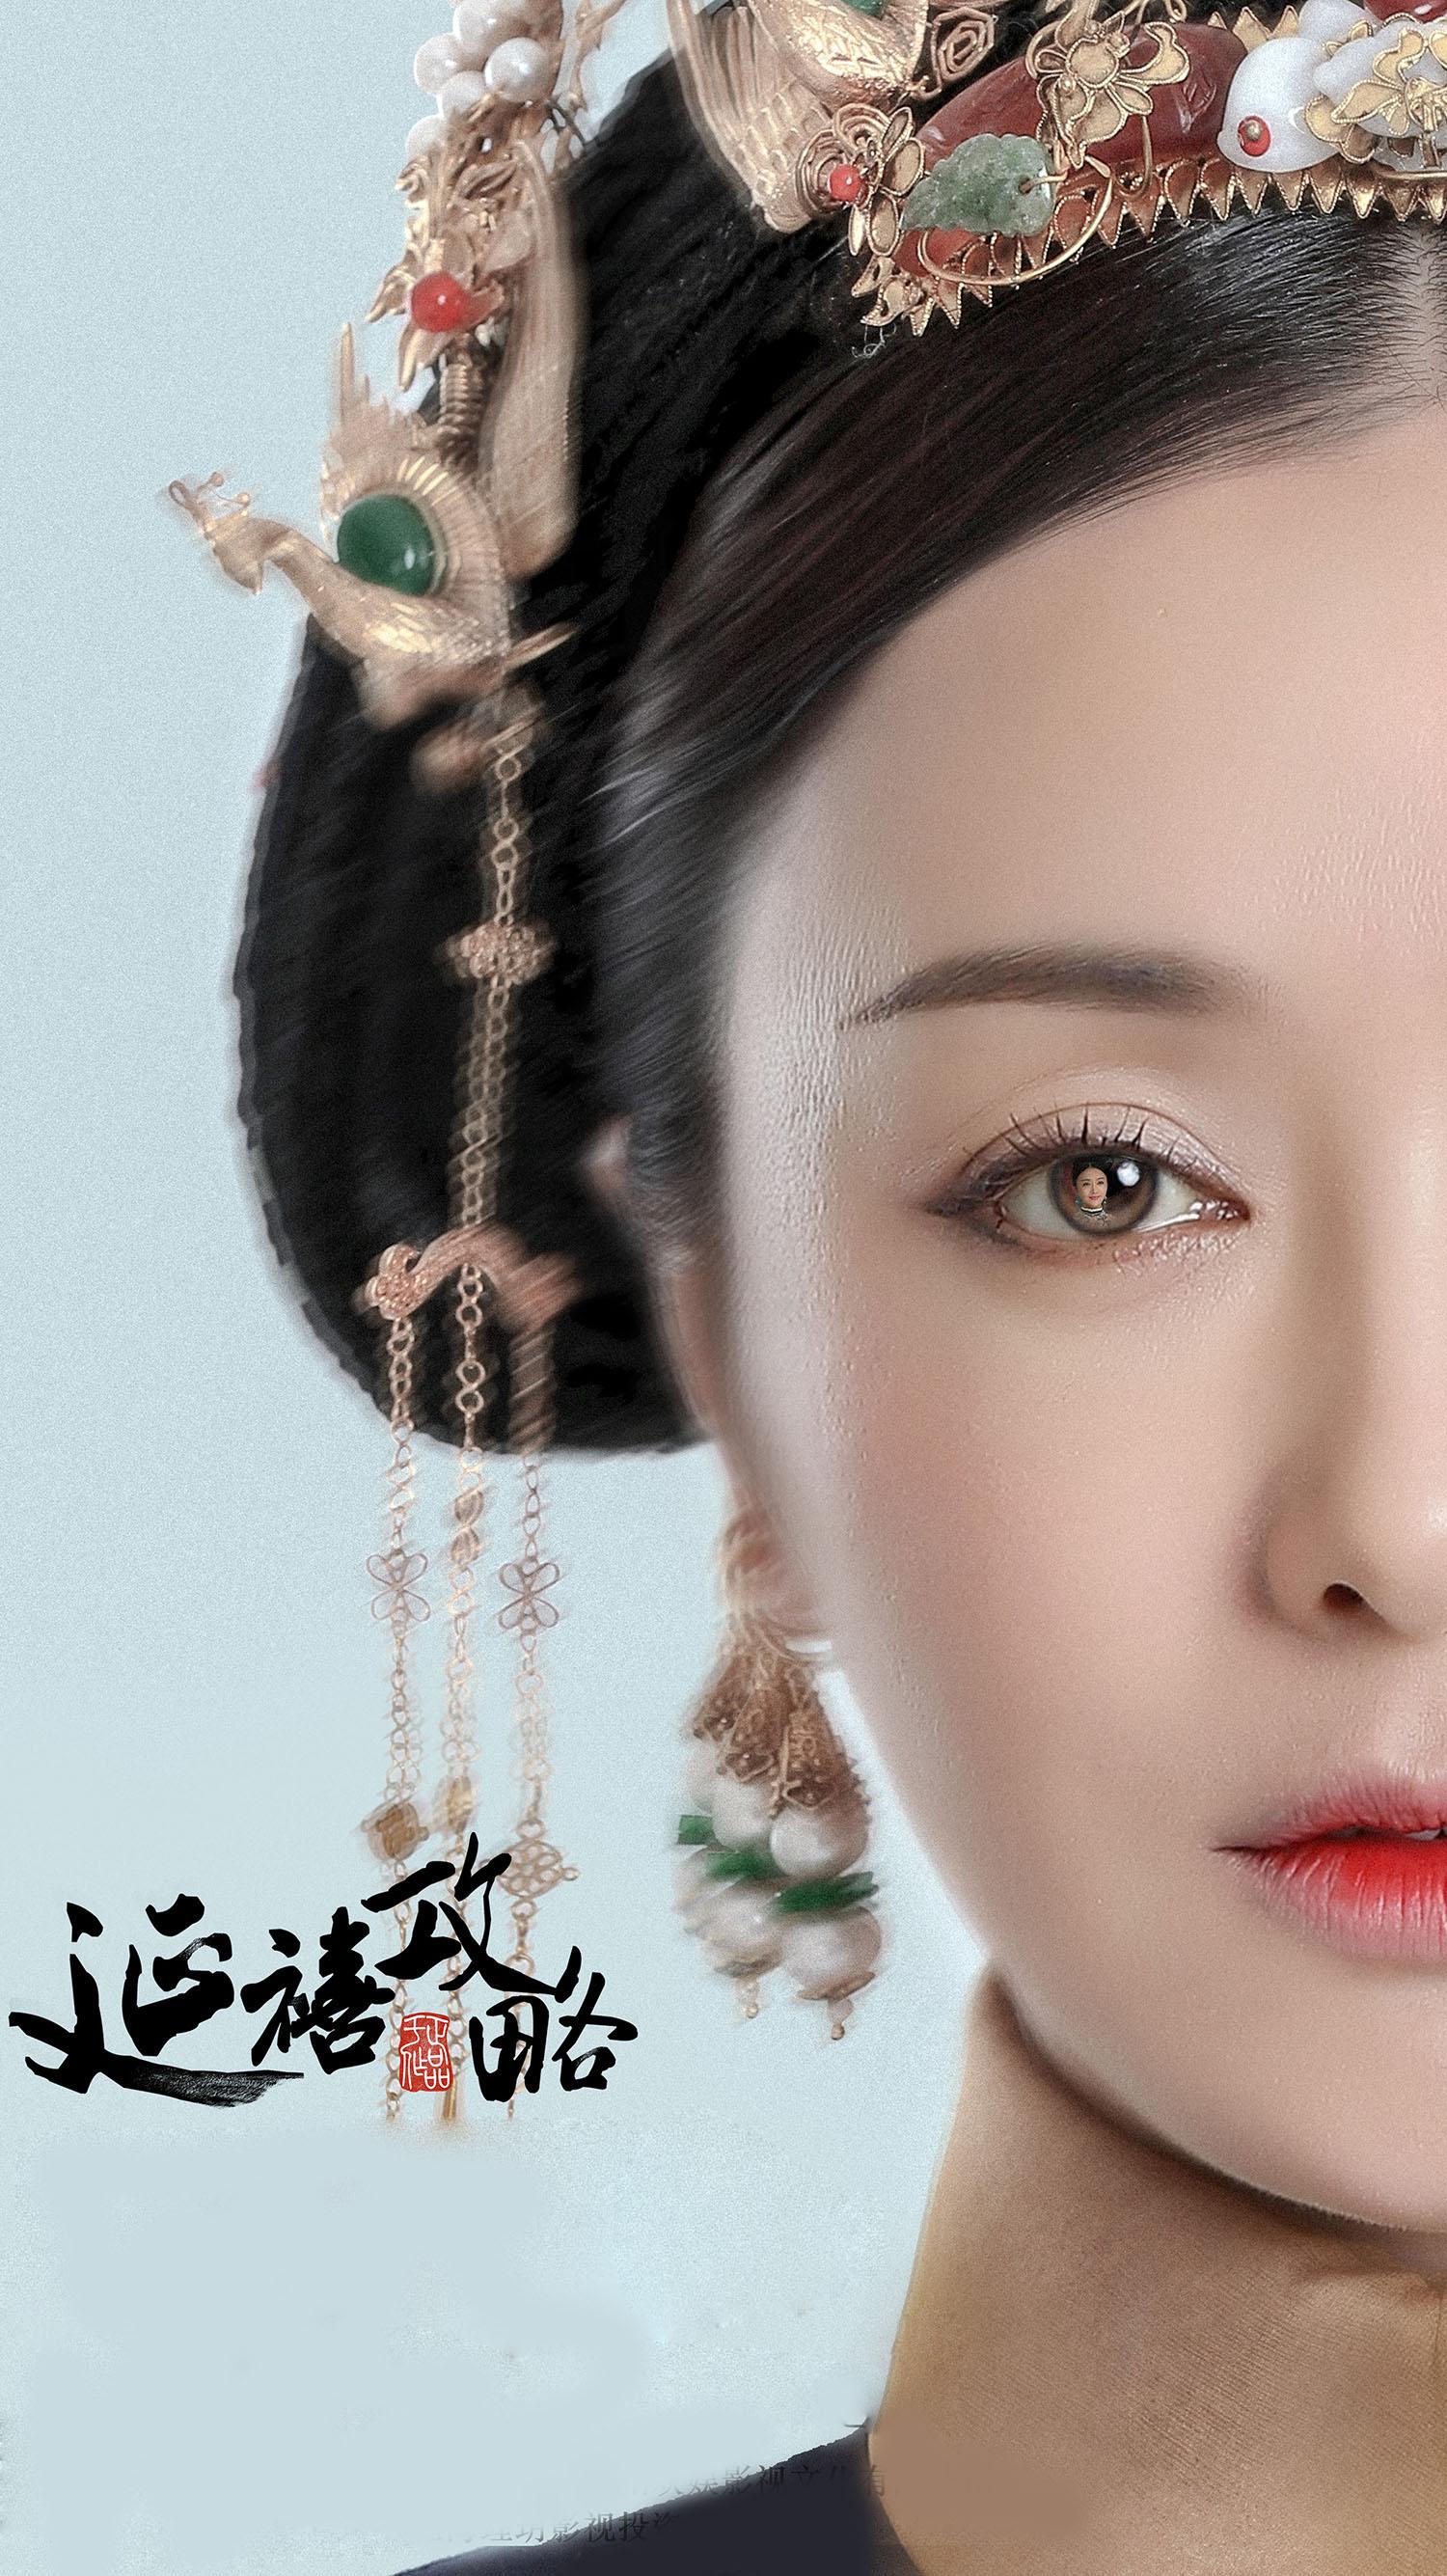 Афиша и кадры из телесериала «Покорение дворца Яньси (The Story of Yanxi Palace)»